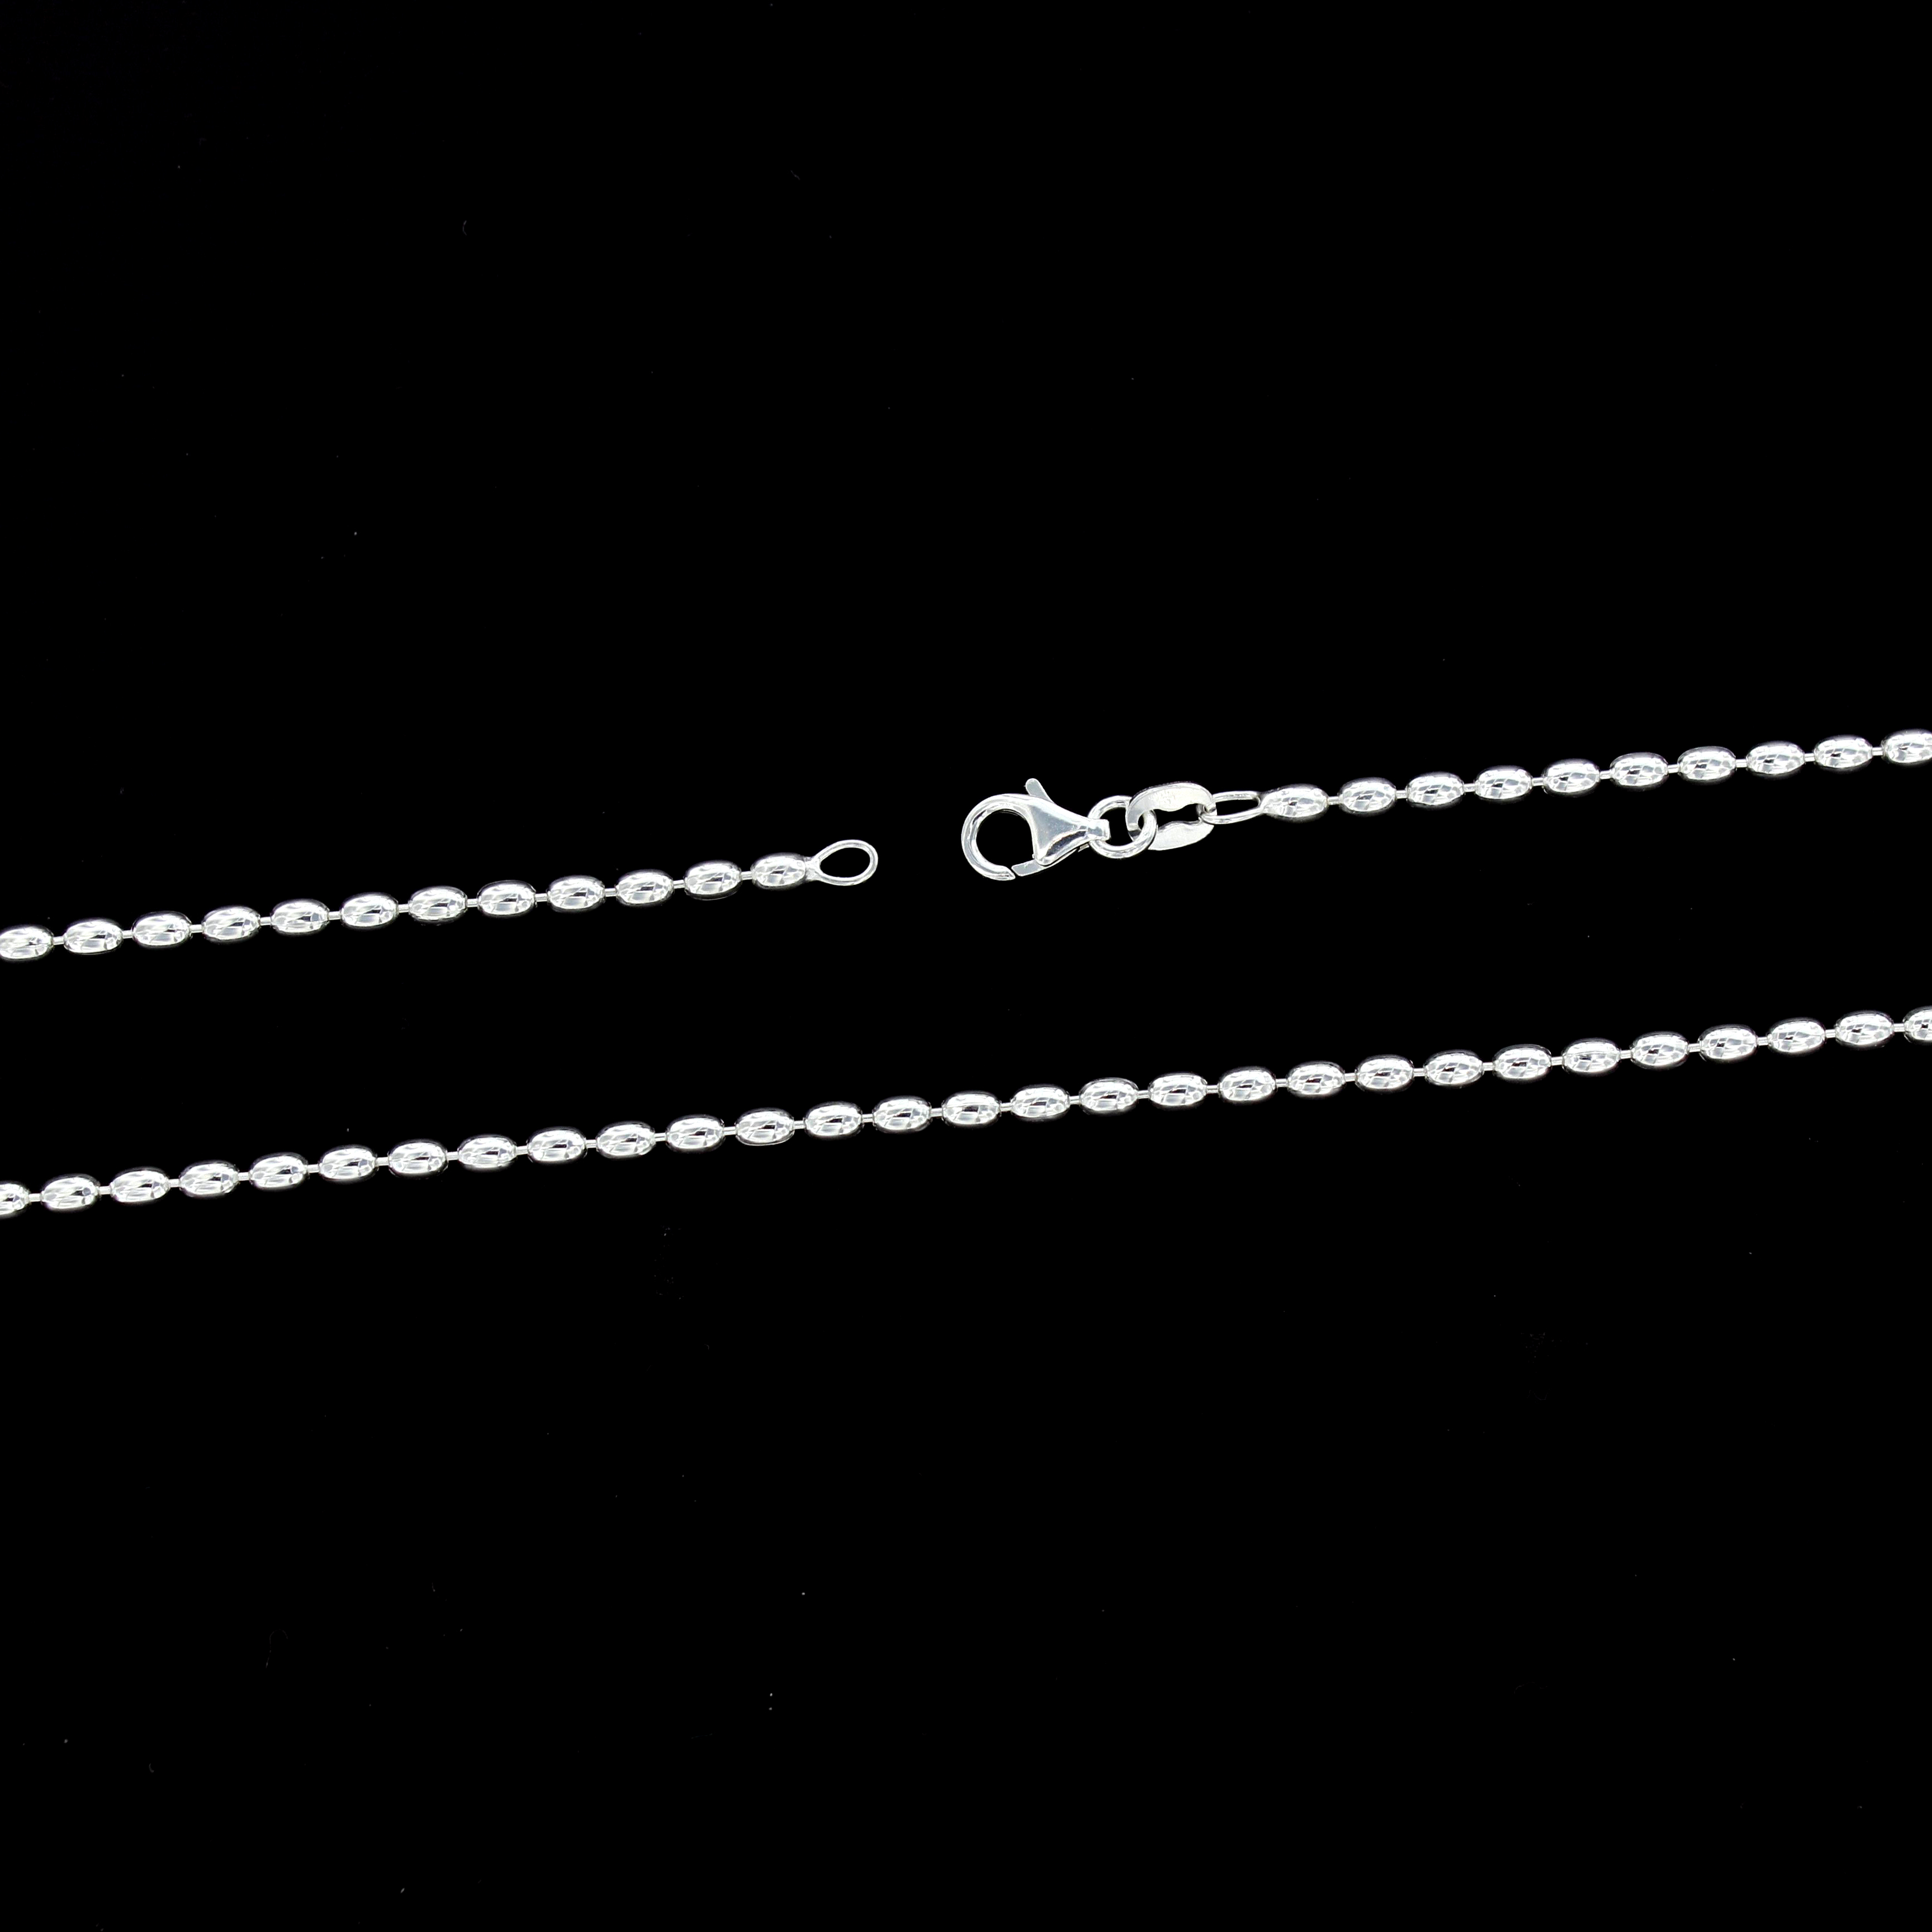 KAARIS CP093 OLIIVI KAULAKETJU 2,3 mm